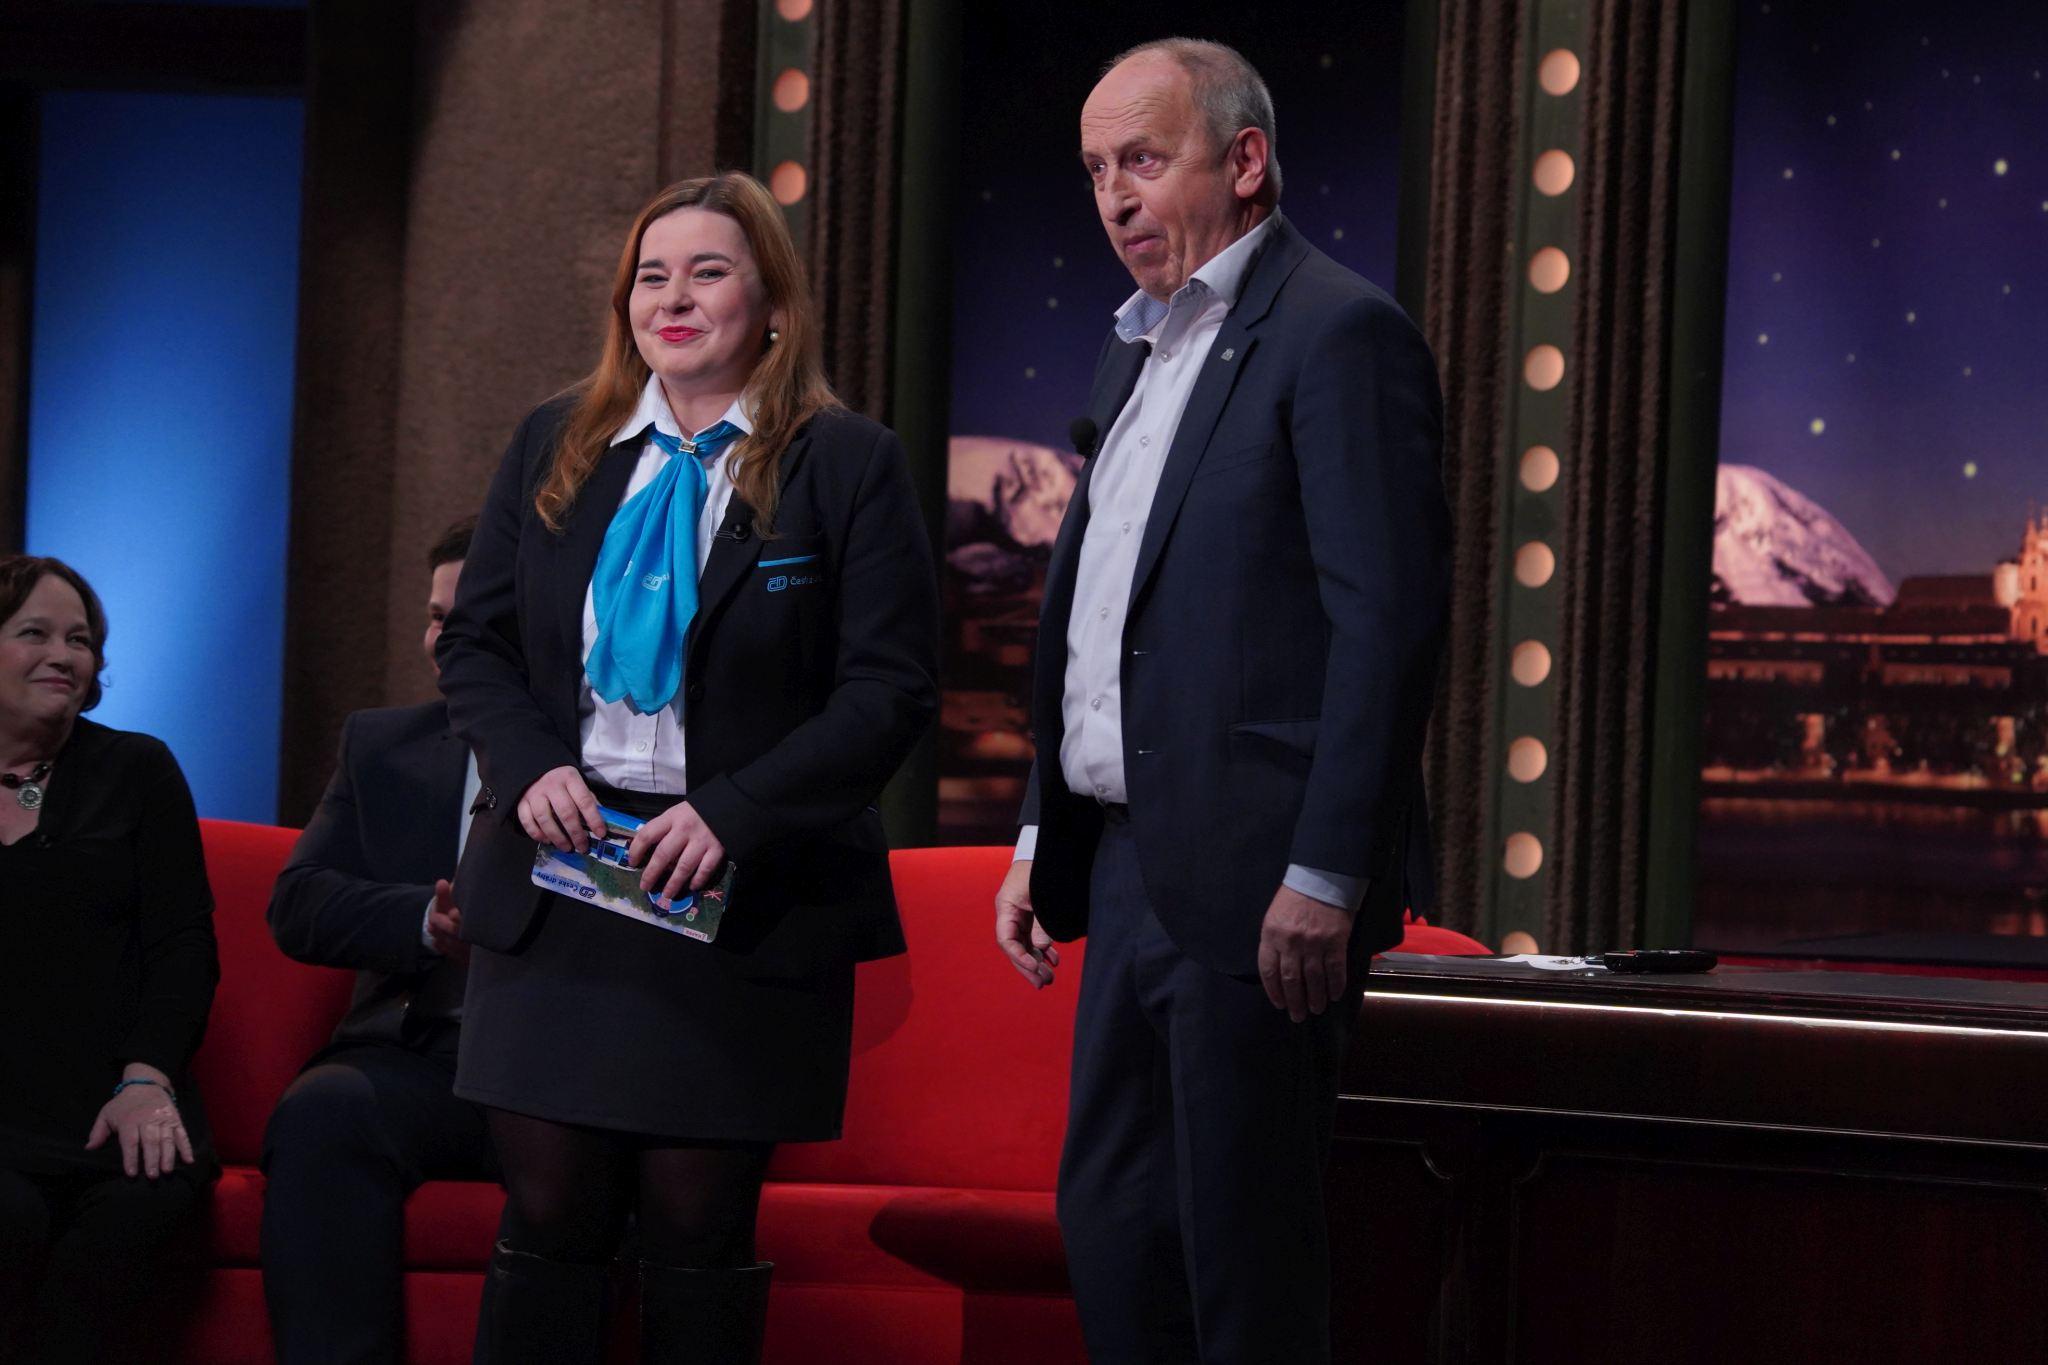 Nikola Šponiarová alias Bláznivá průvodčí v SJK 27. 1. 2021; v pozadí zleva herečka Jitka Smutná a zpěvák Martin Schreiner